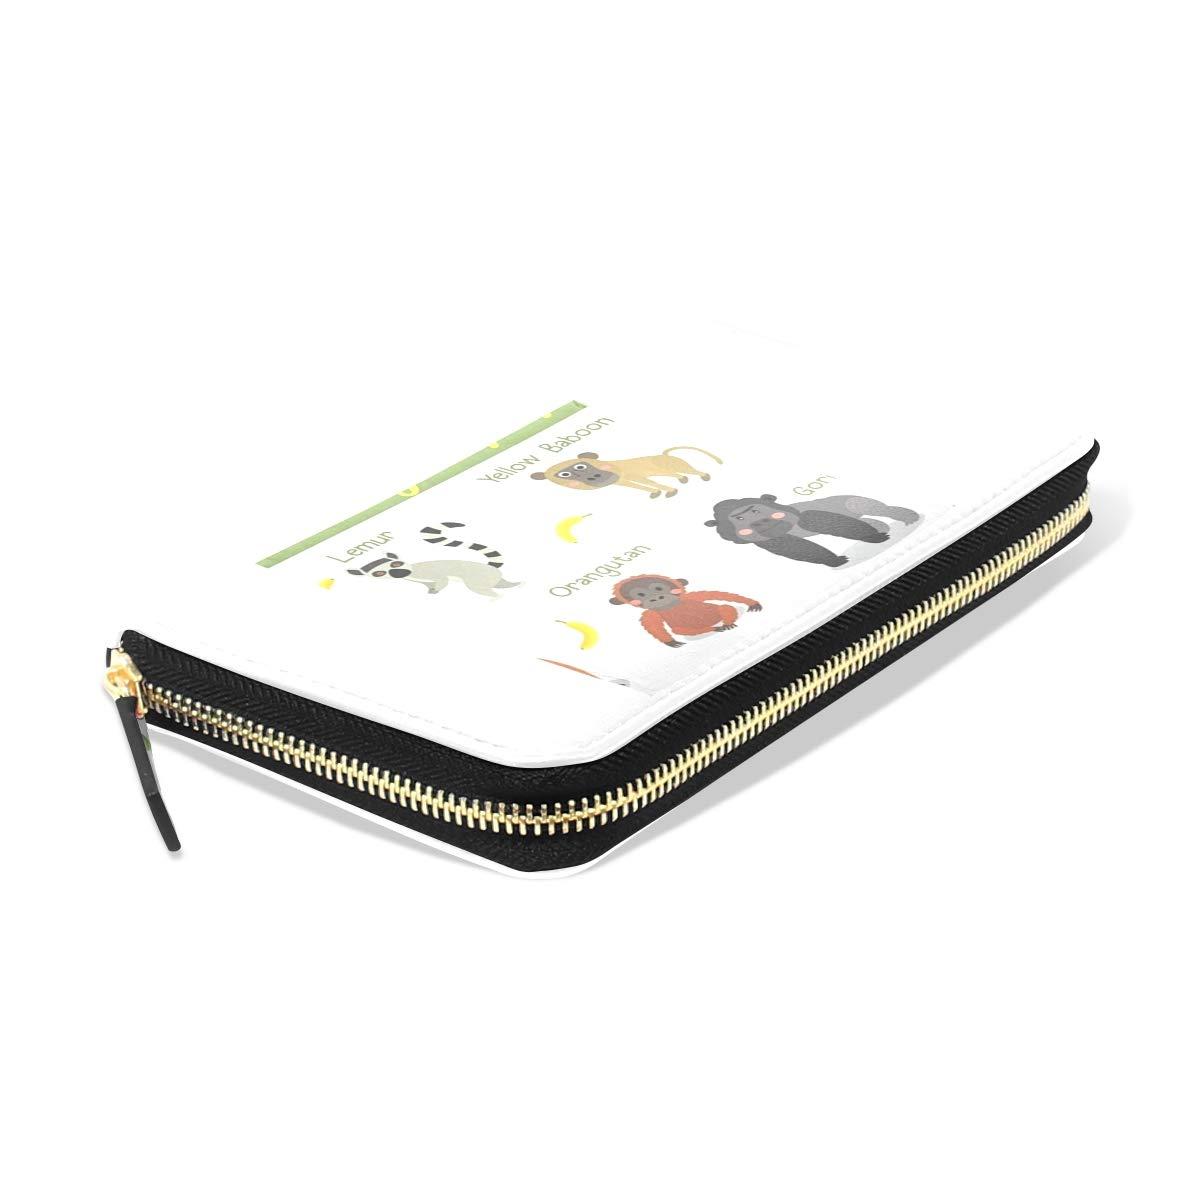 Womens Wallets Aminals Night Leather Passport Wallet Coin Purse Girls Handbags